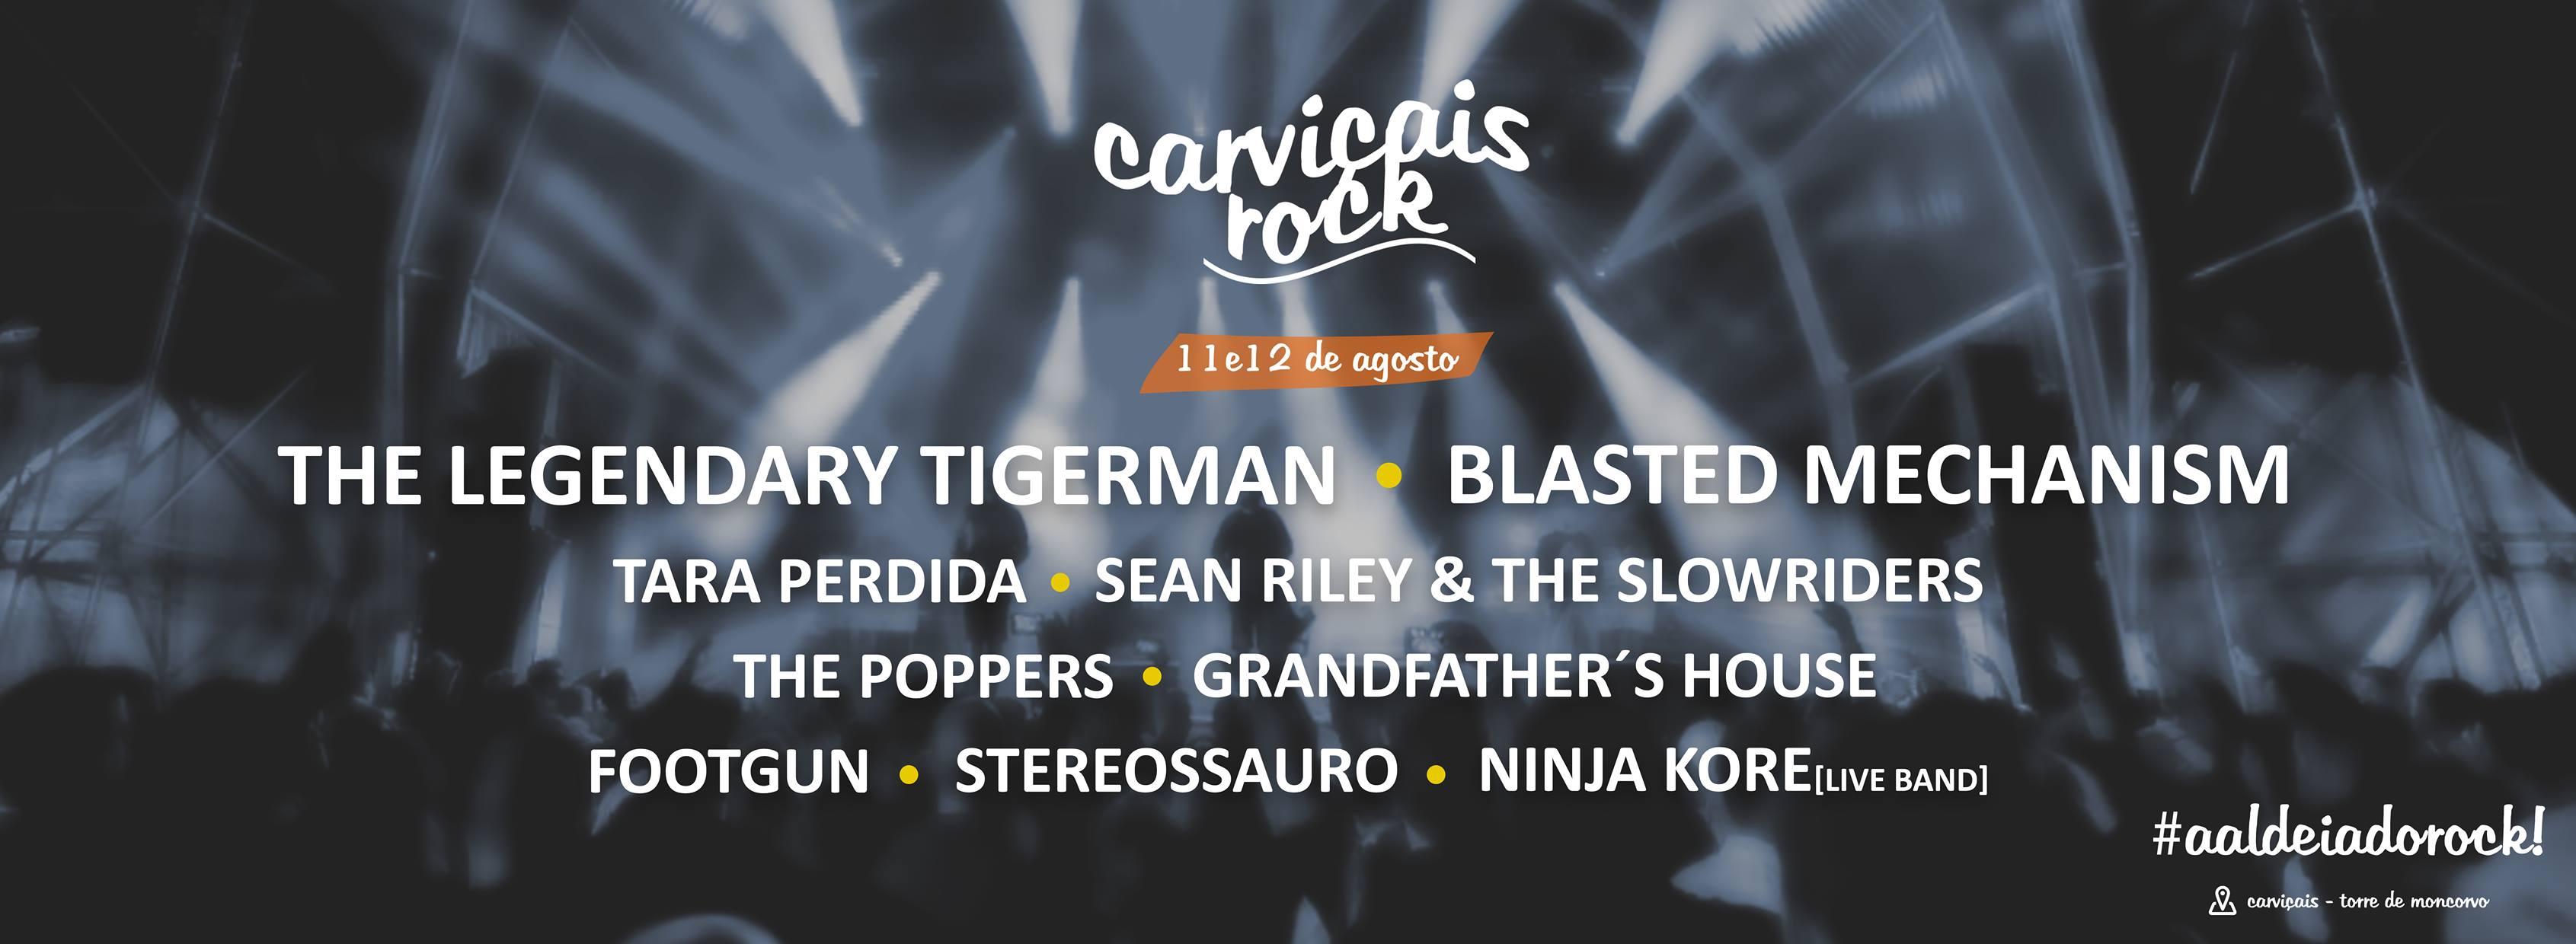 Cartaz Festival Carviçais Rock 2017